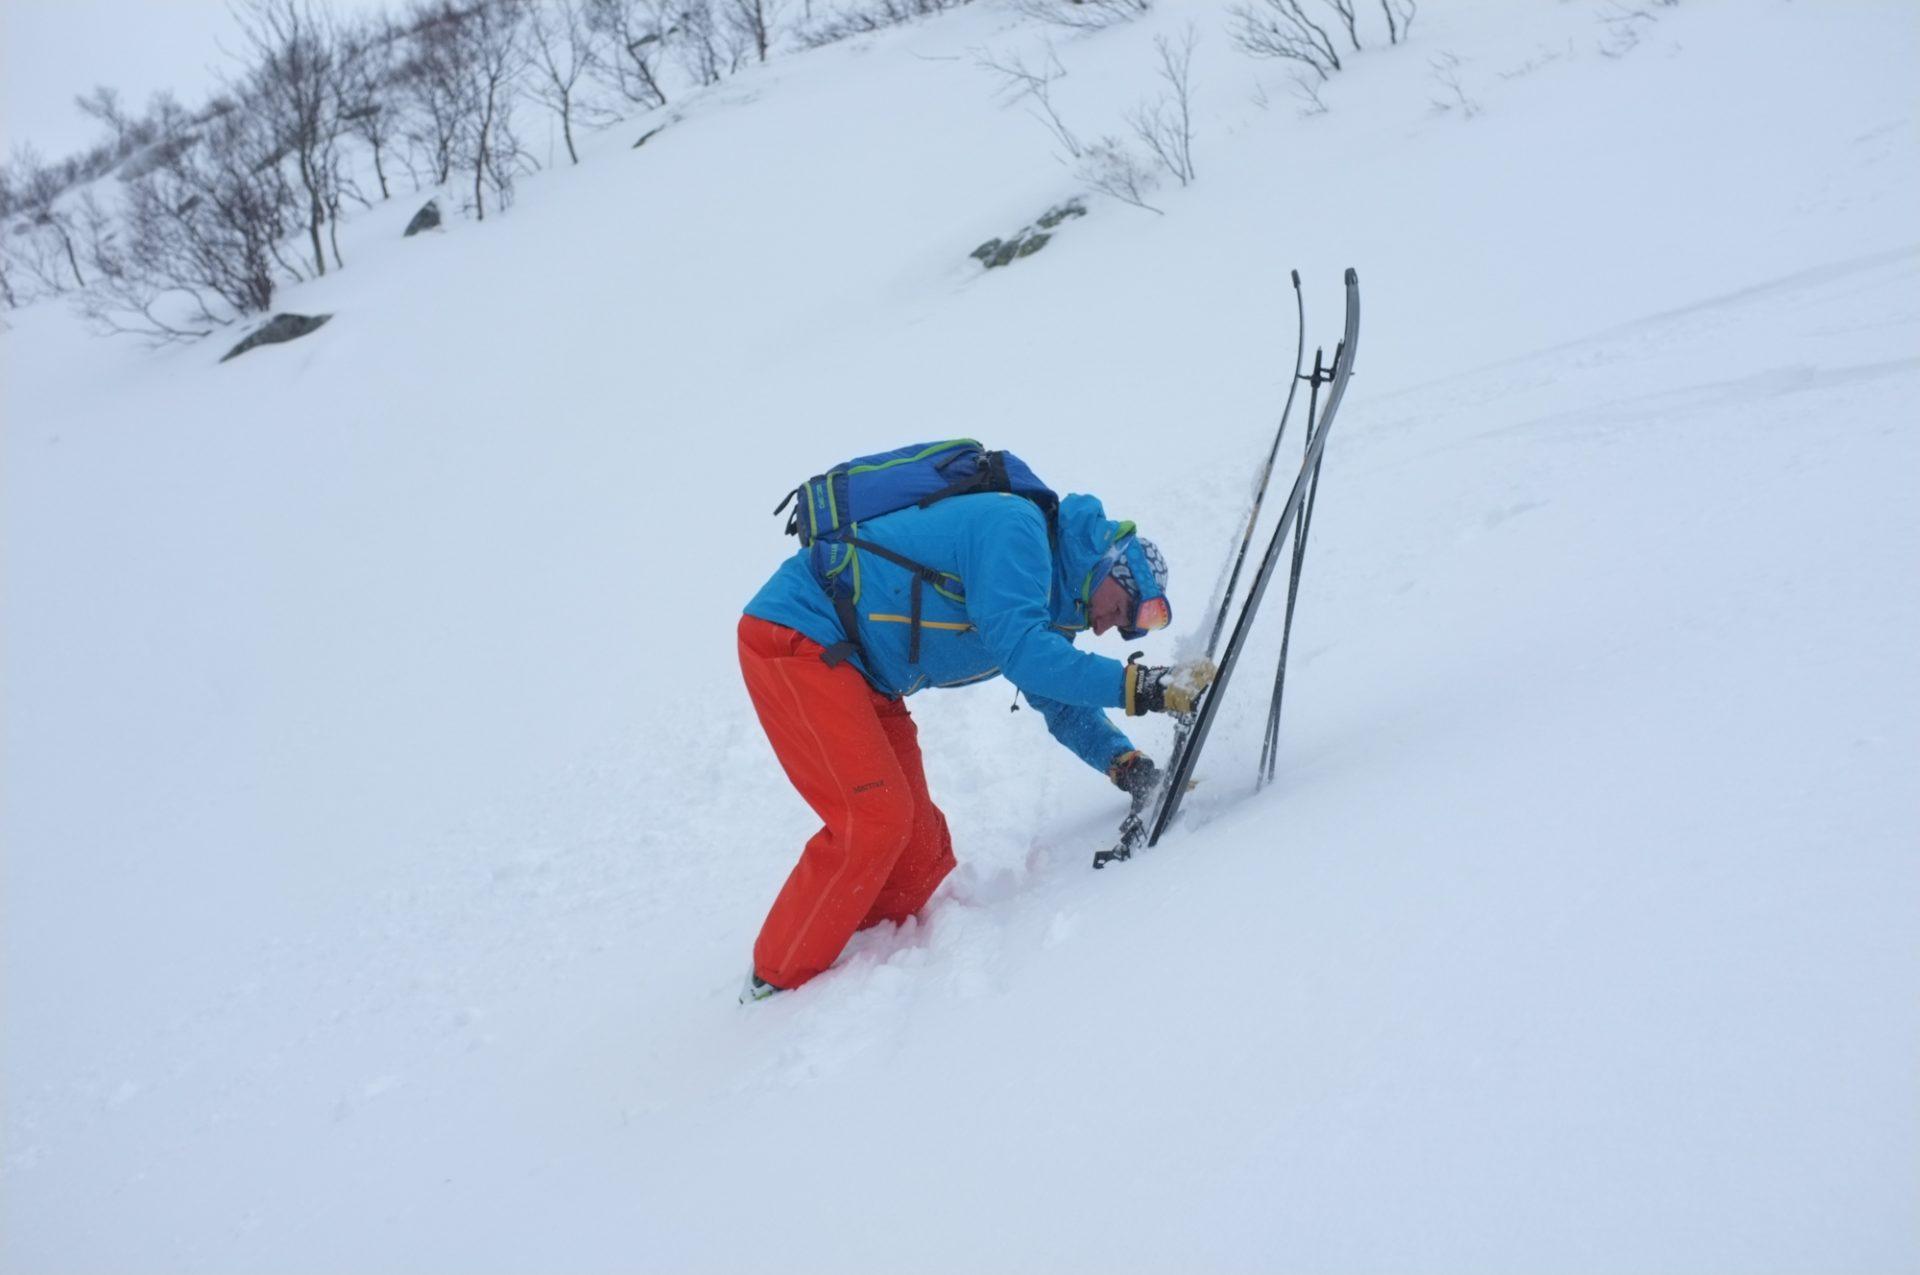 Bergsteigertipp Ski ausziehen 4 I (c) Peter Plattner